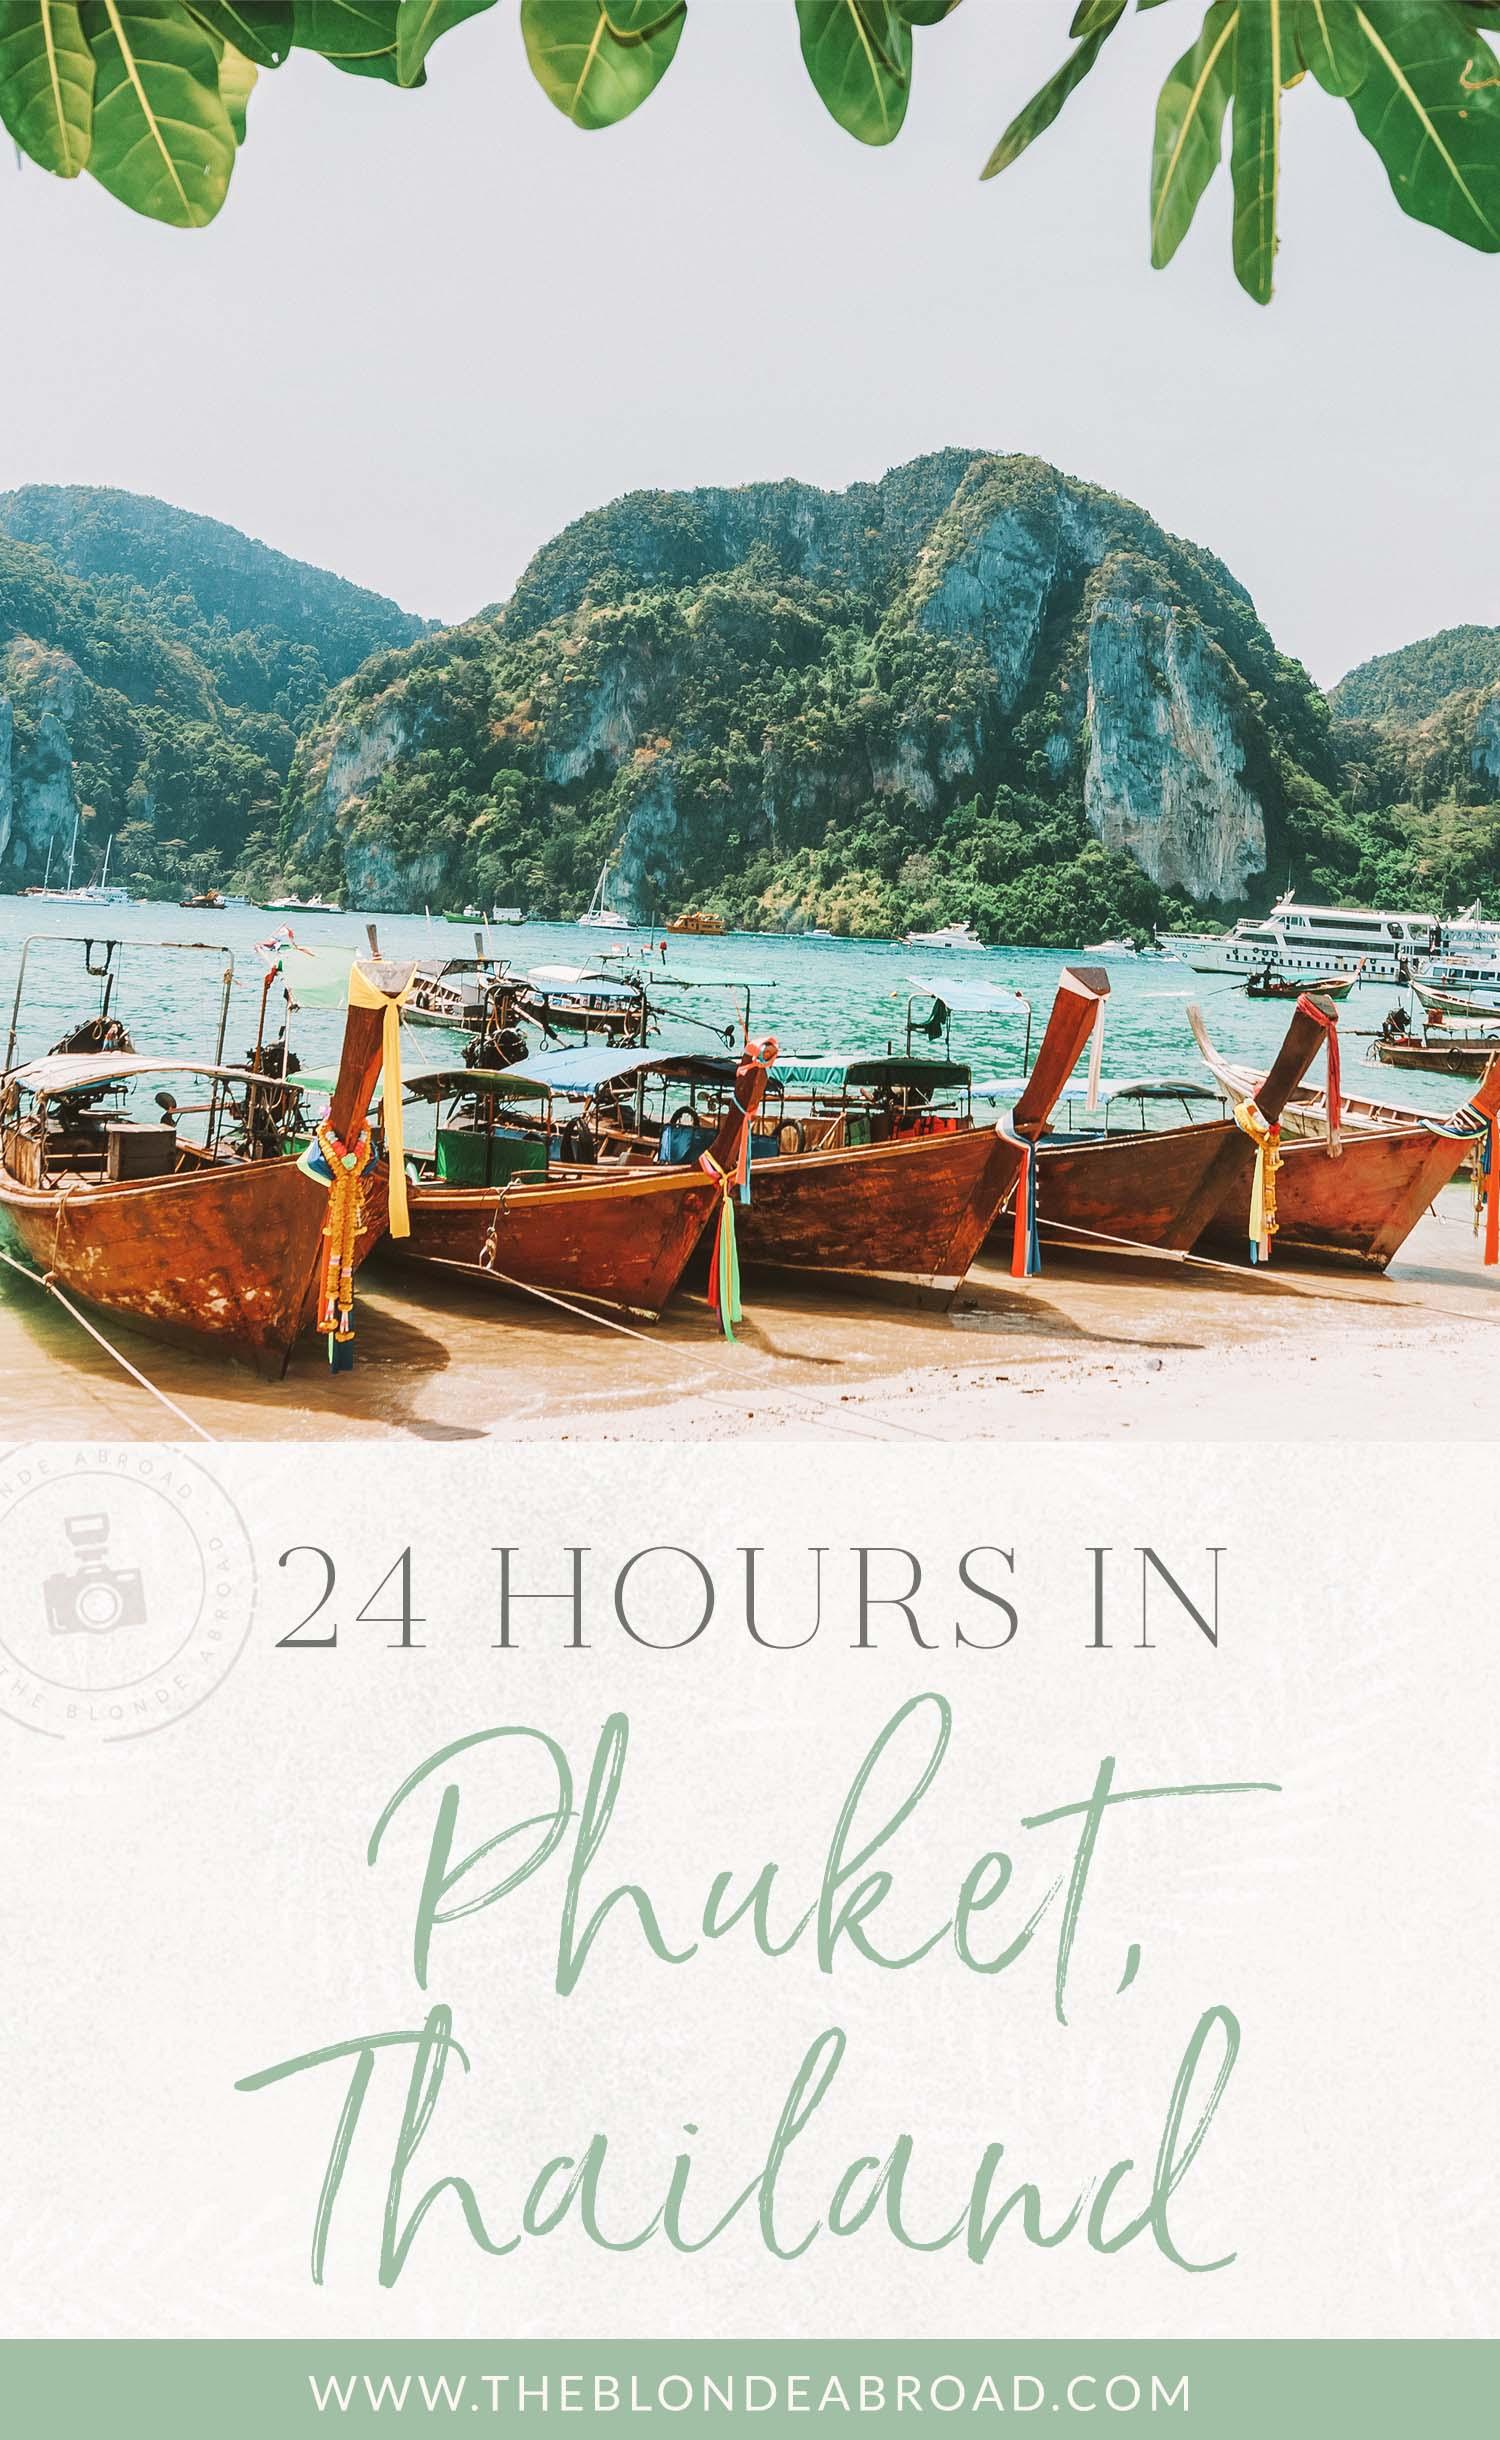 24 hours in phuket thailand